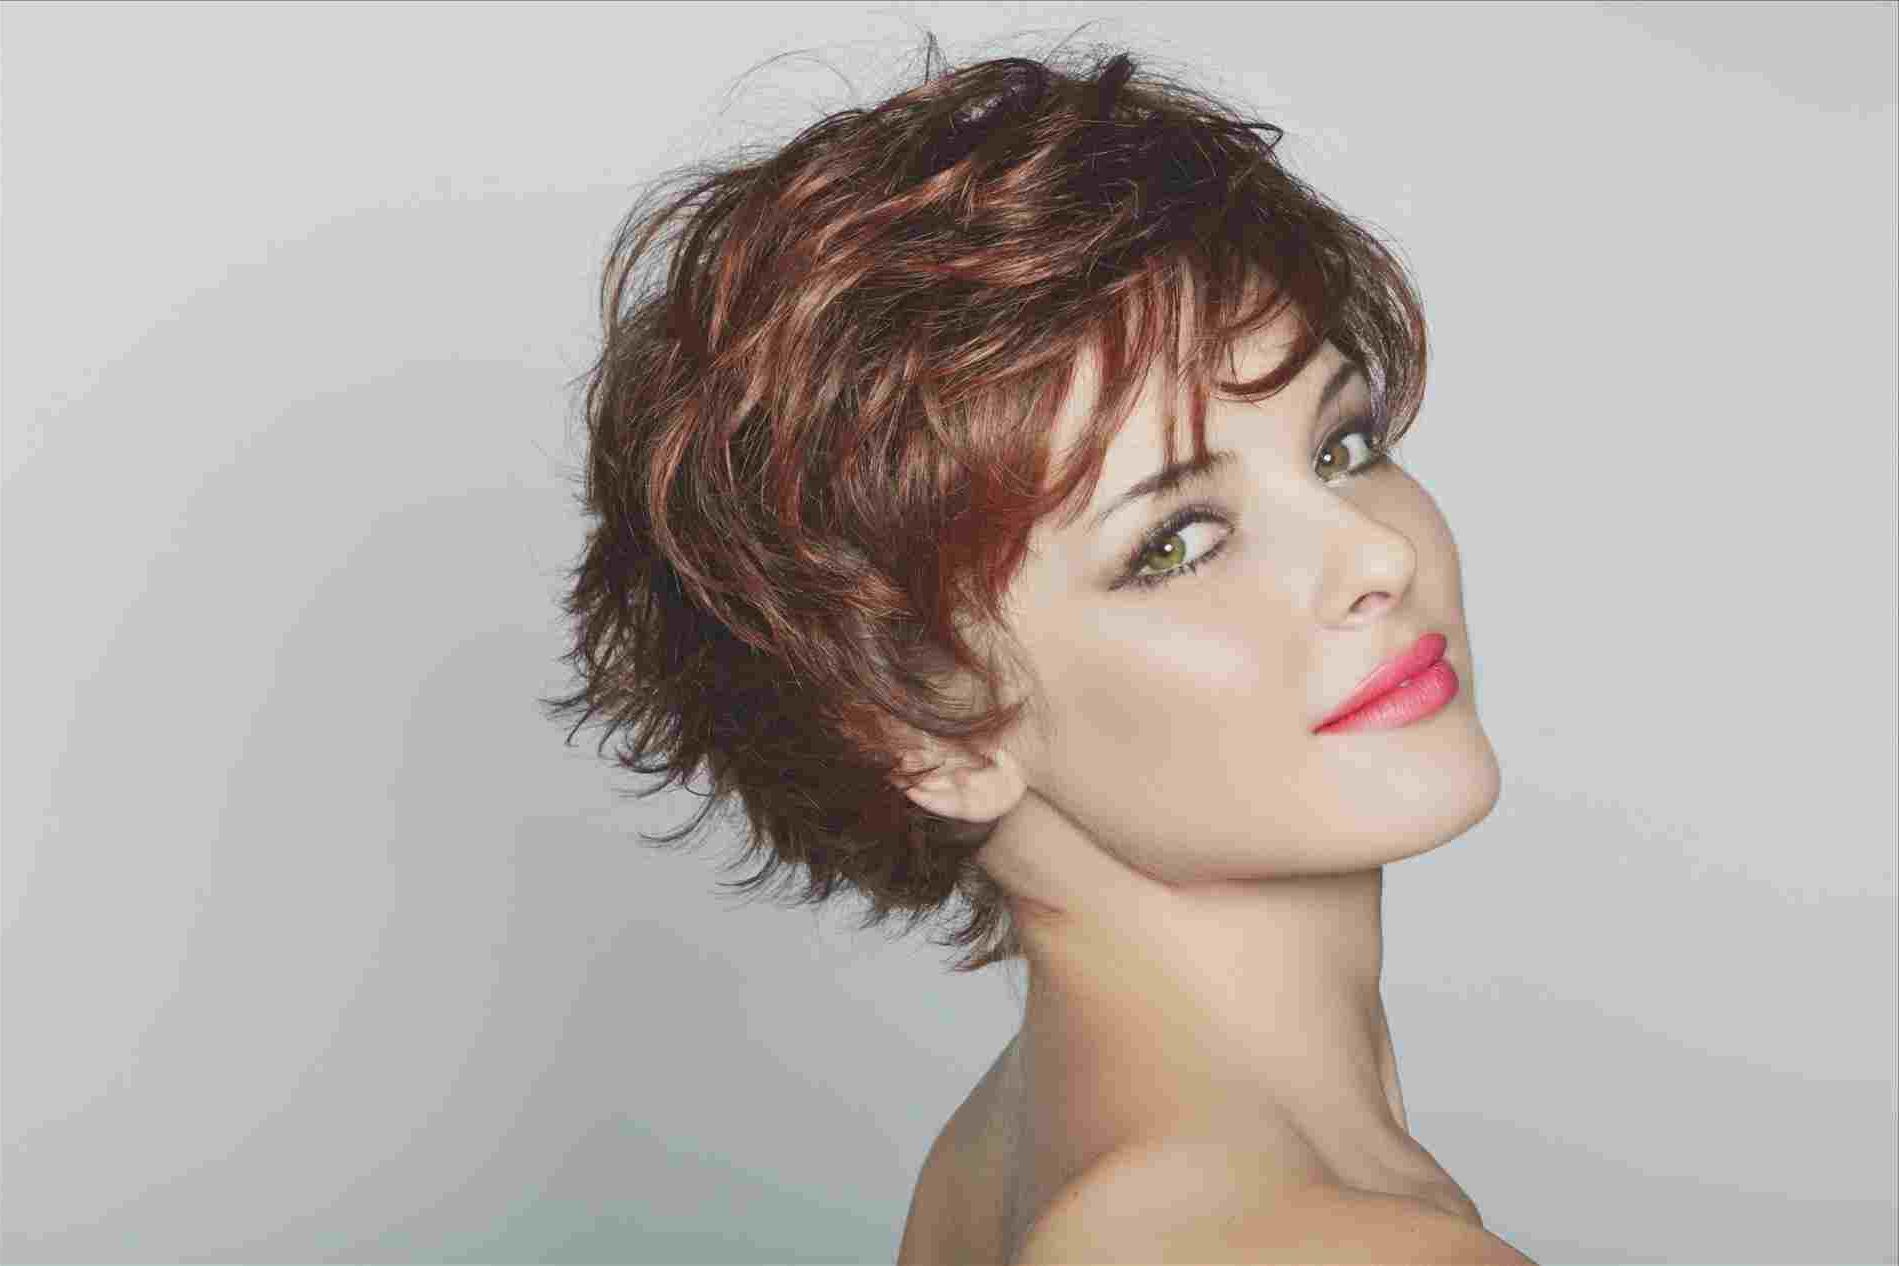 Short Haircuts For Fine Curly Hair 2018   Hairsjdi With Short Hairstyles For Curly Fine Hair (View 12 of 25)